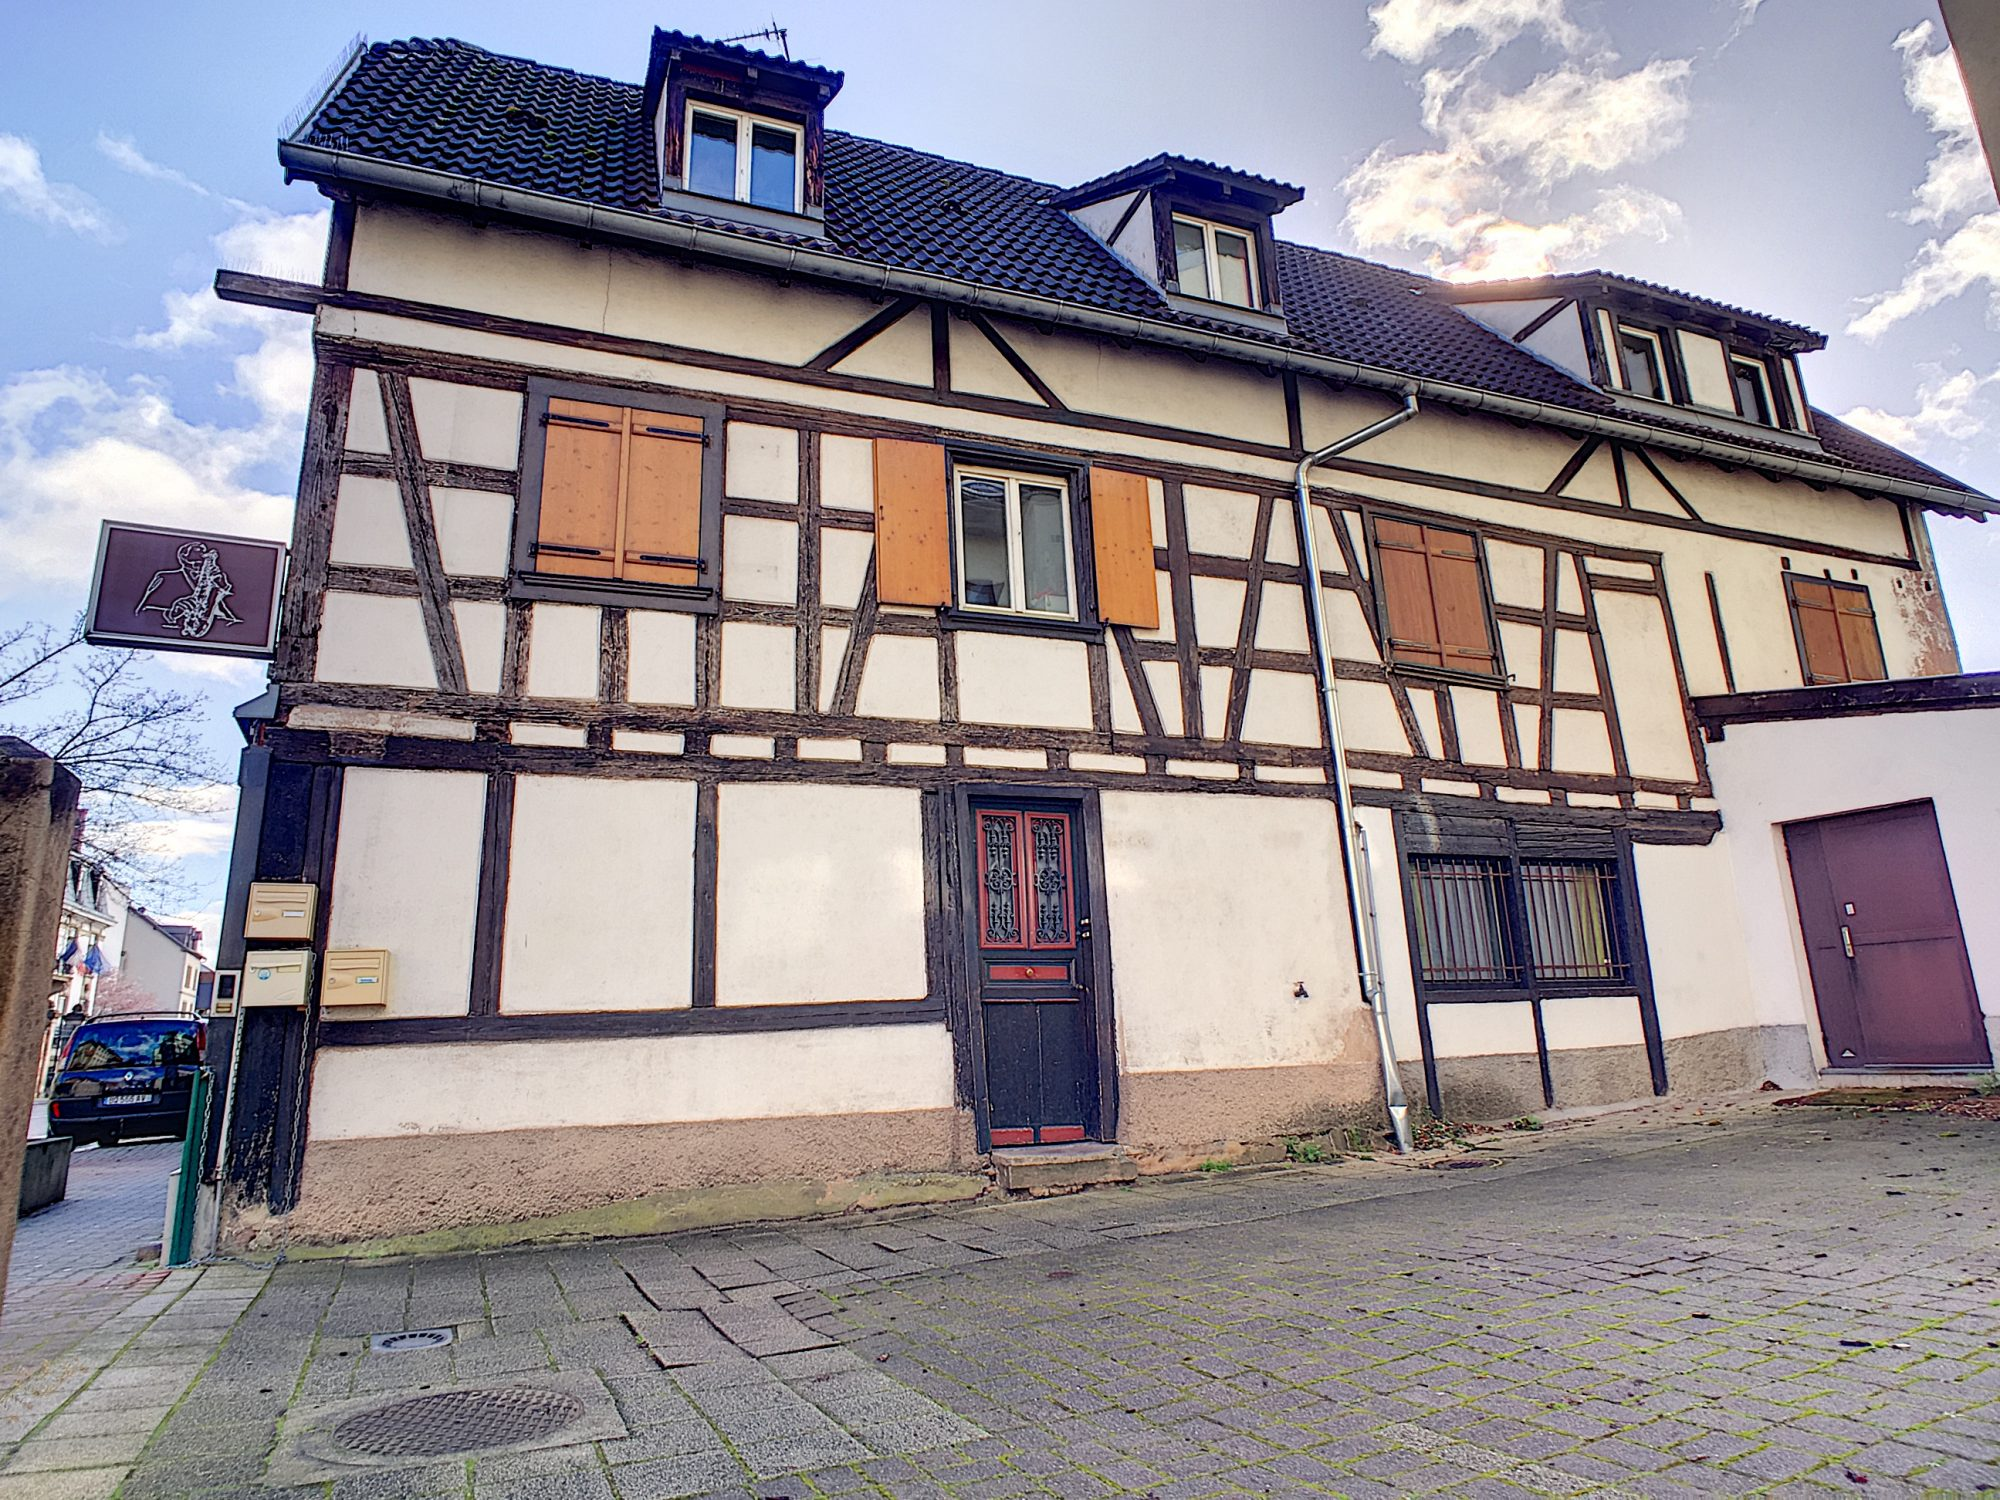 Schlitigheim, locaux mixte habitation / professionnels de 83m2